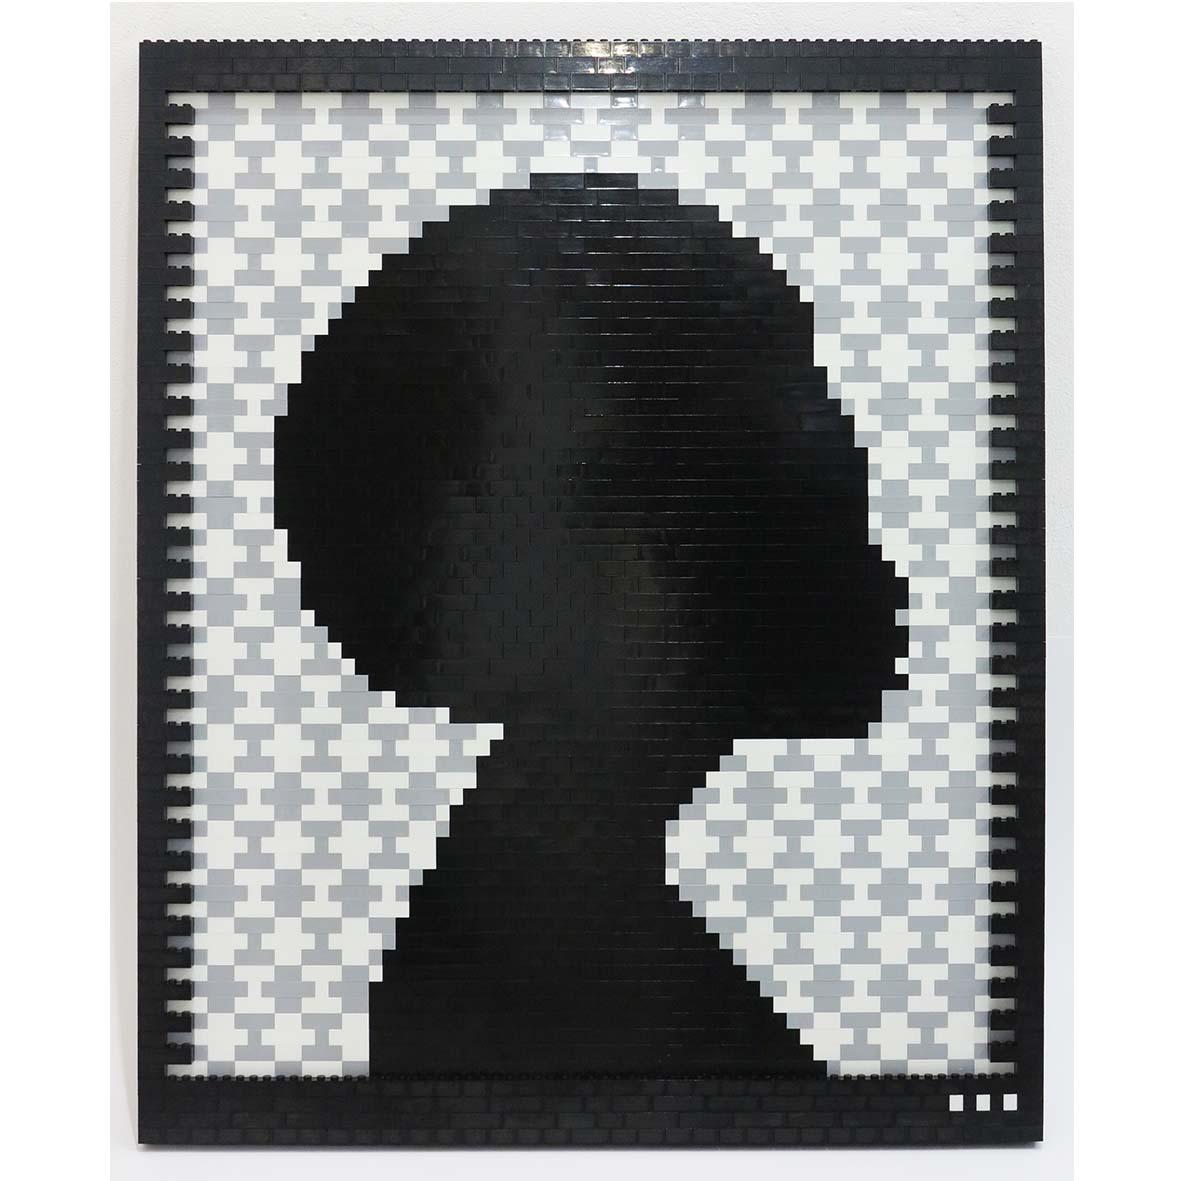 Faatimah Mohamed-Luke Reflections of a Queen II Yoruba – Grey , 2018 2107 ABS plastic building blocks adhered to Aluminium 65 x 53.5 cm